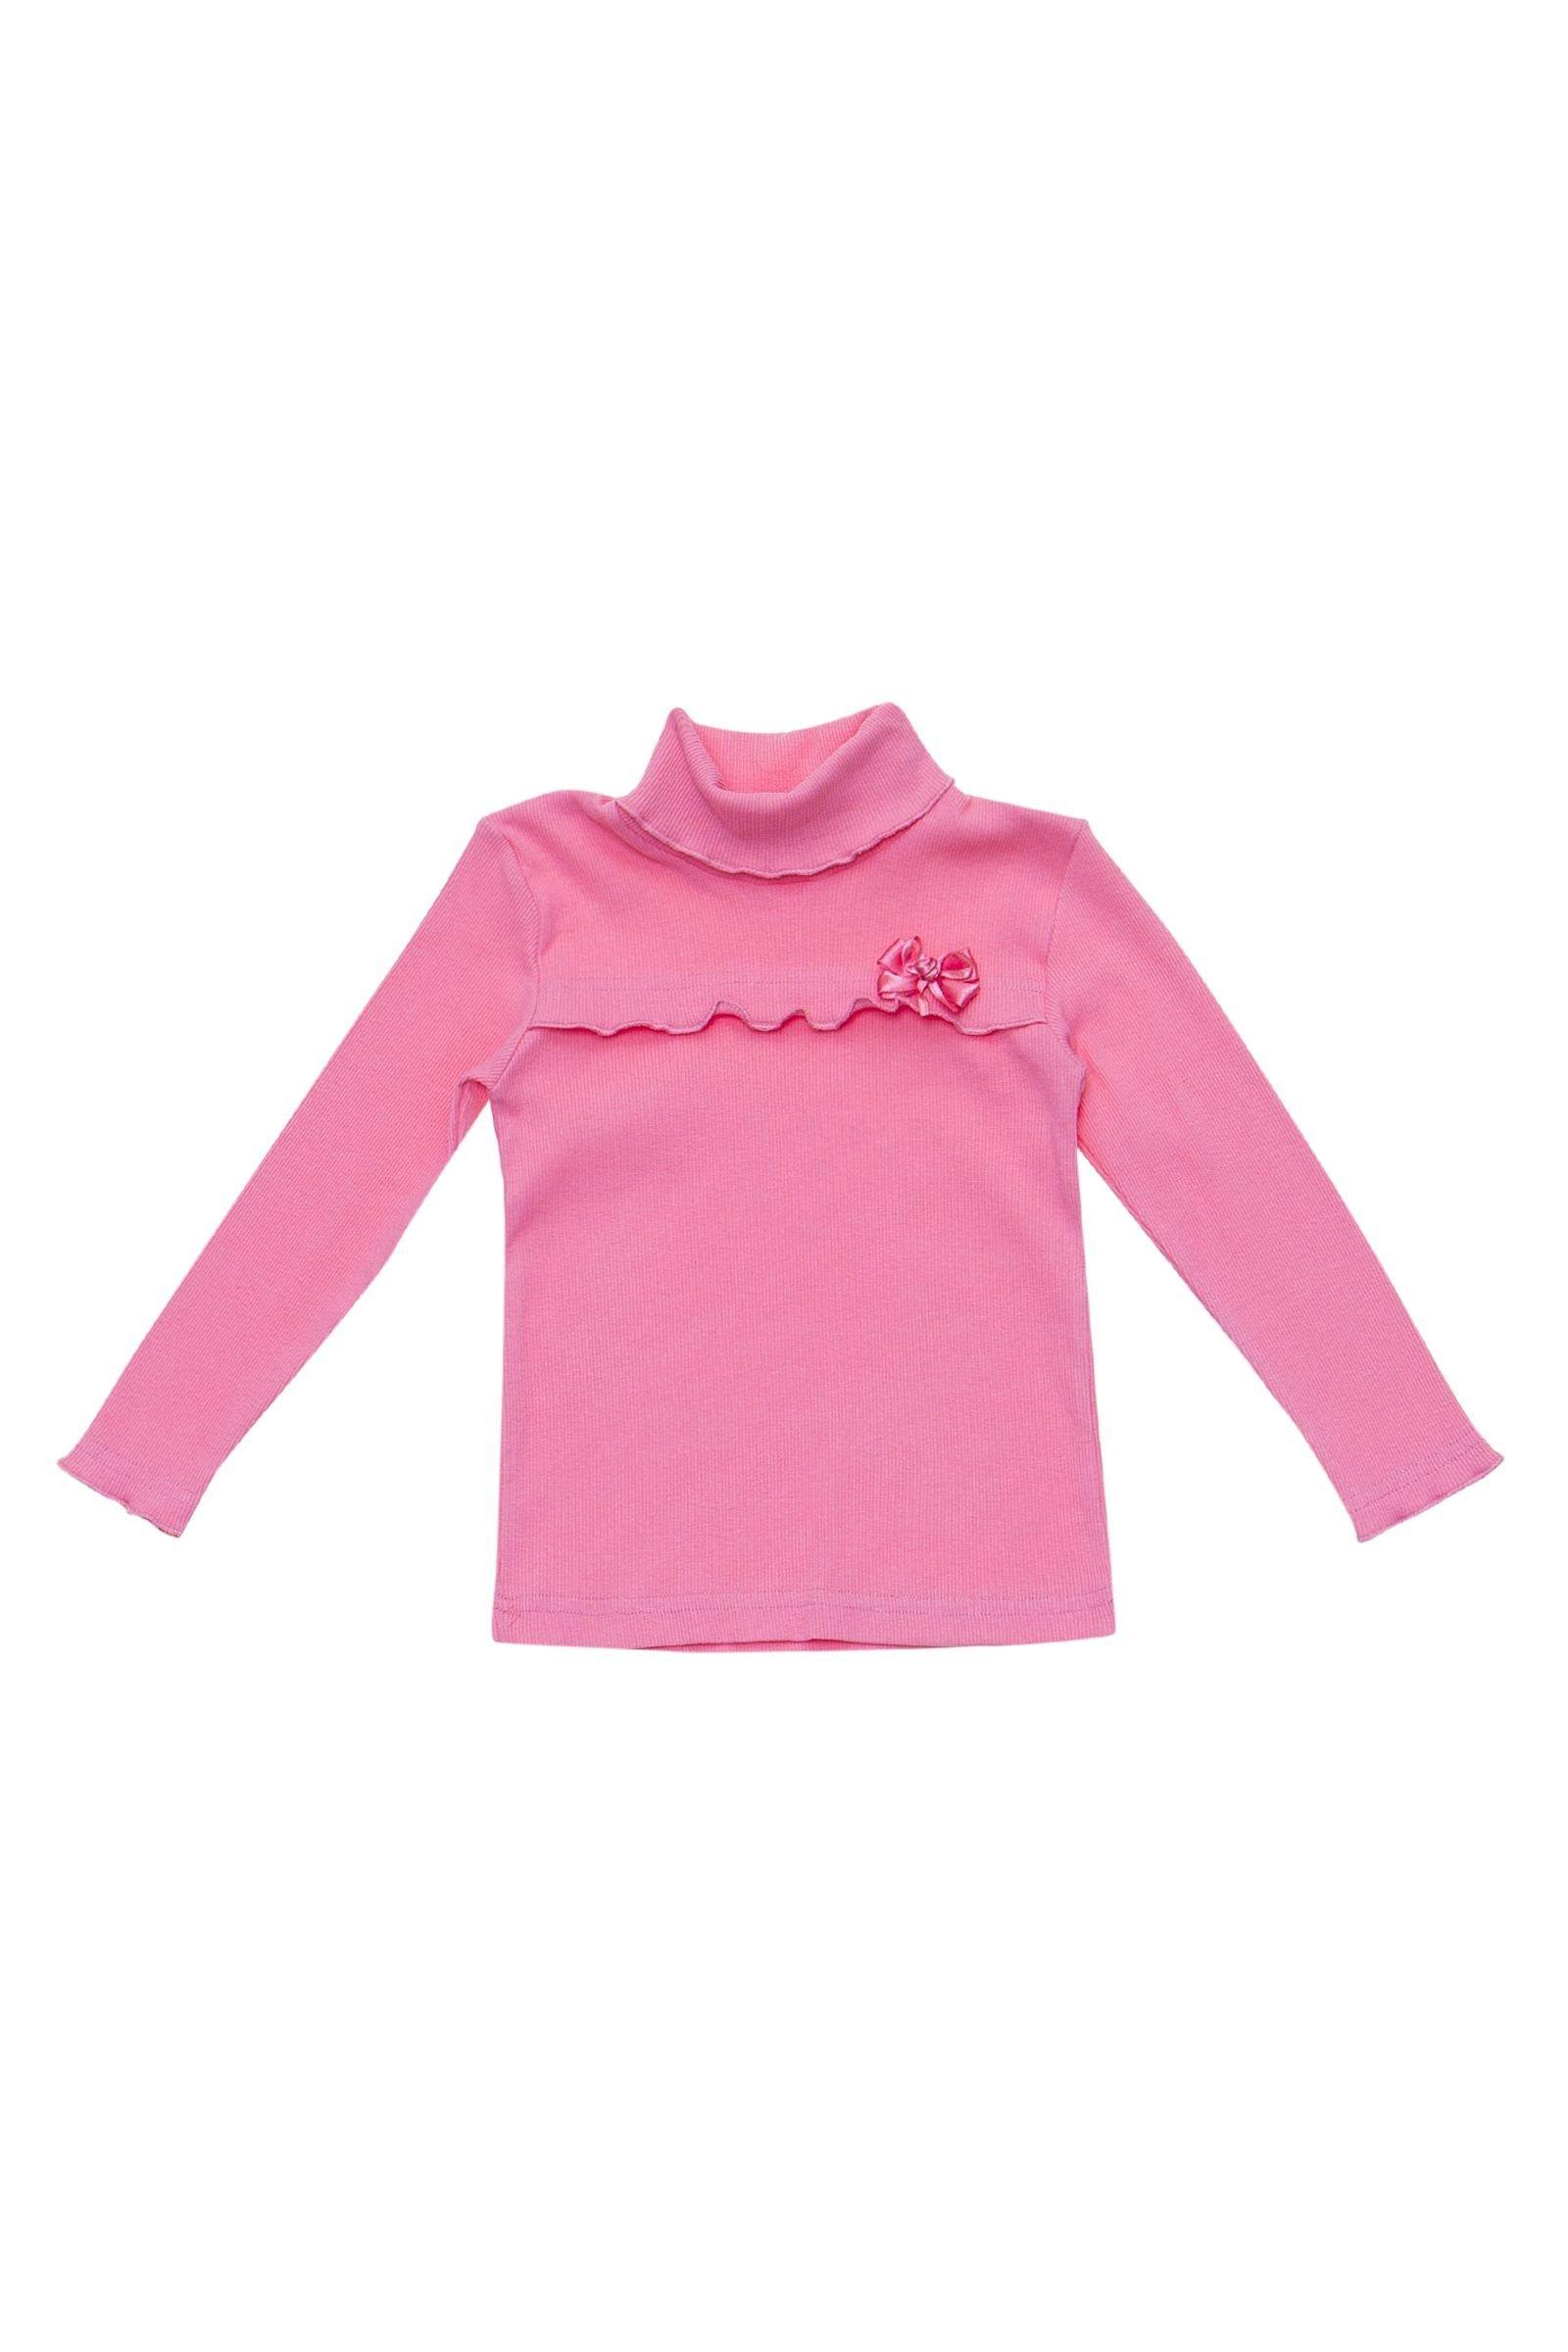 Джемпер для девочки ALLAL12-55